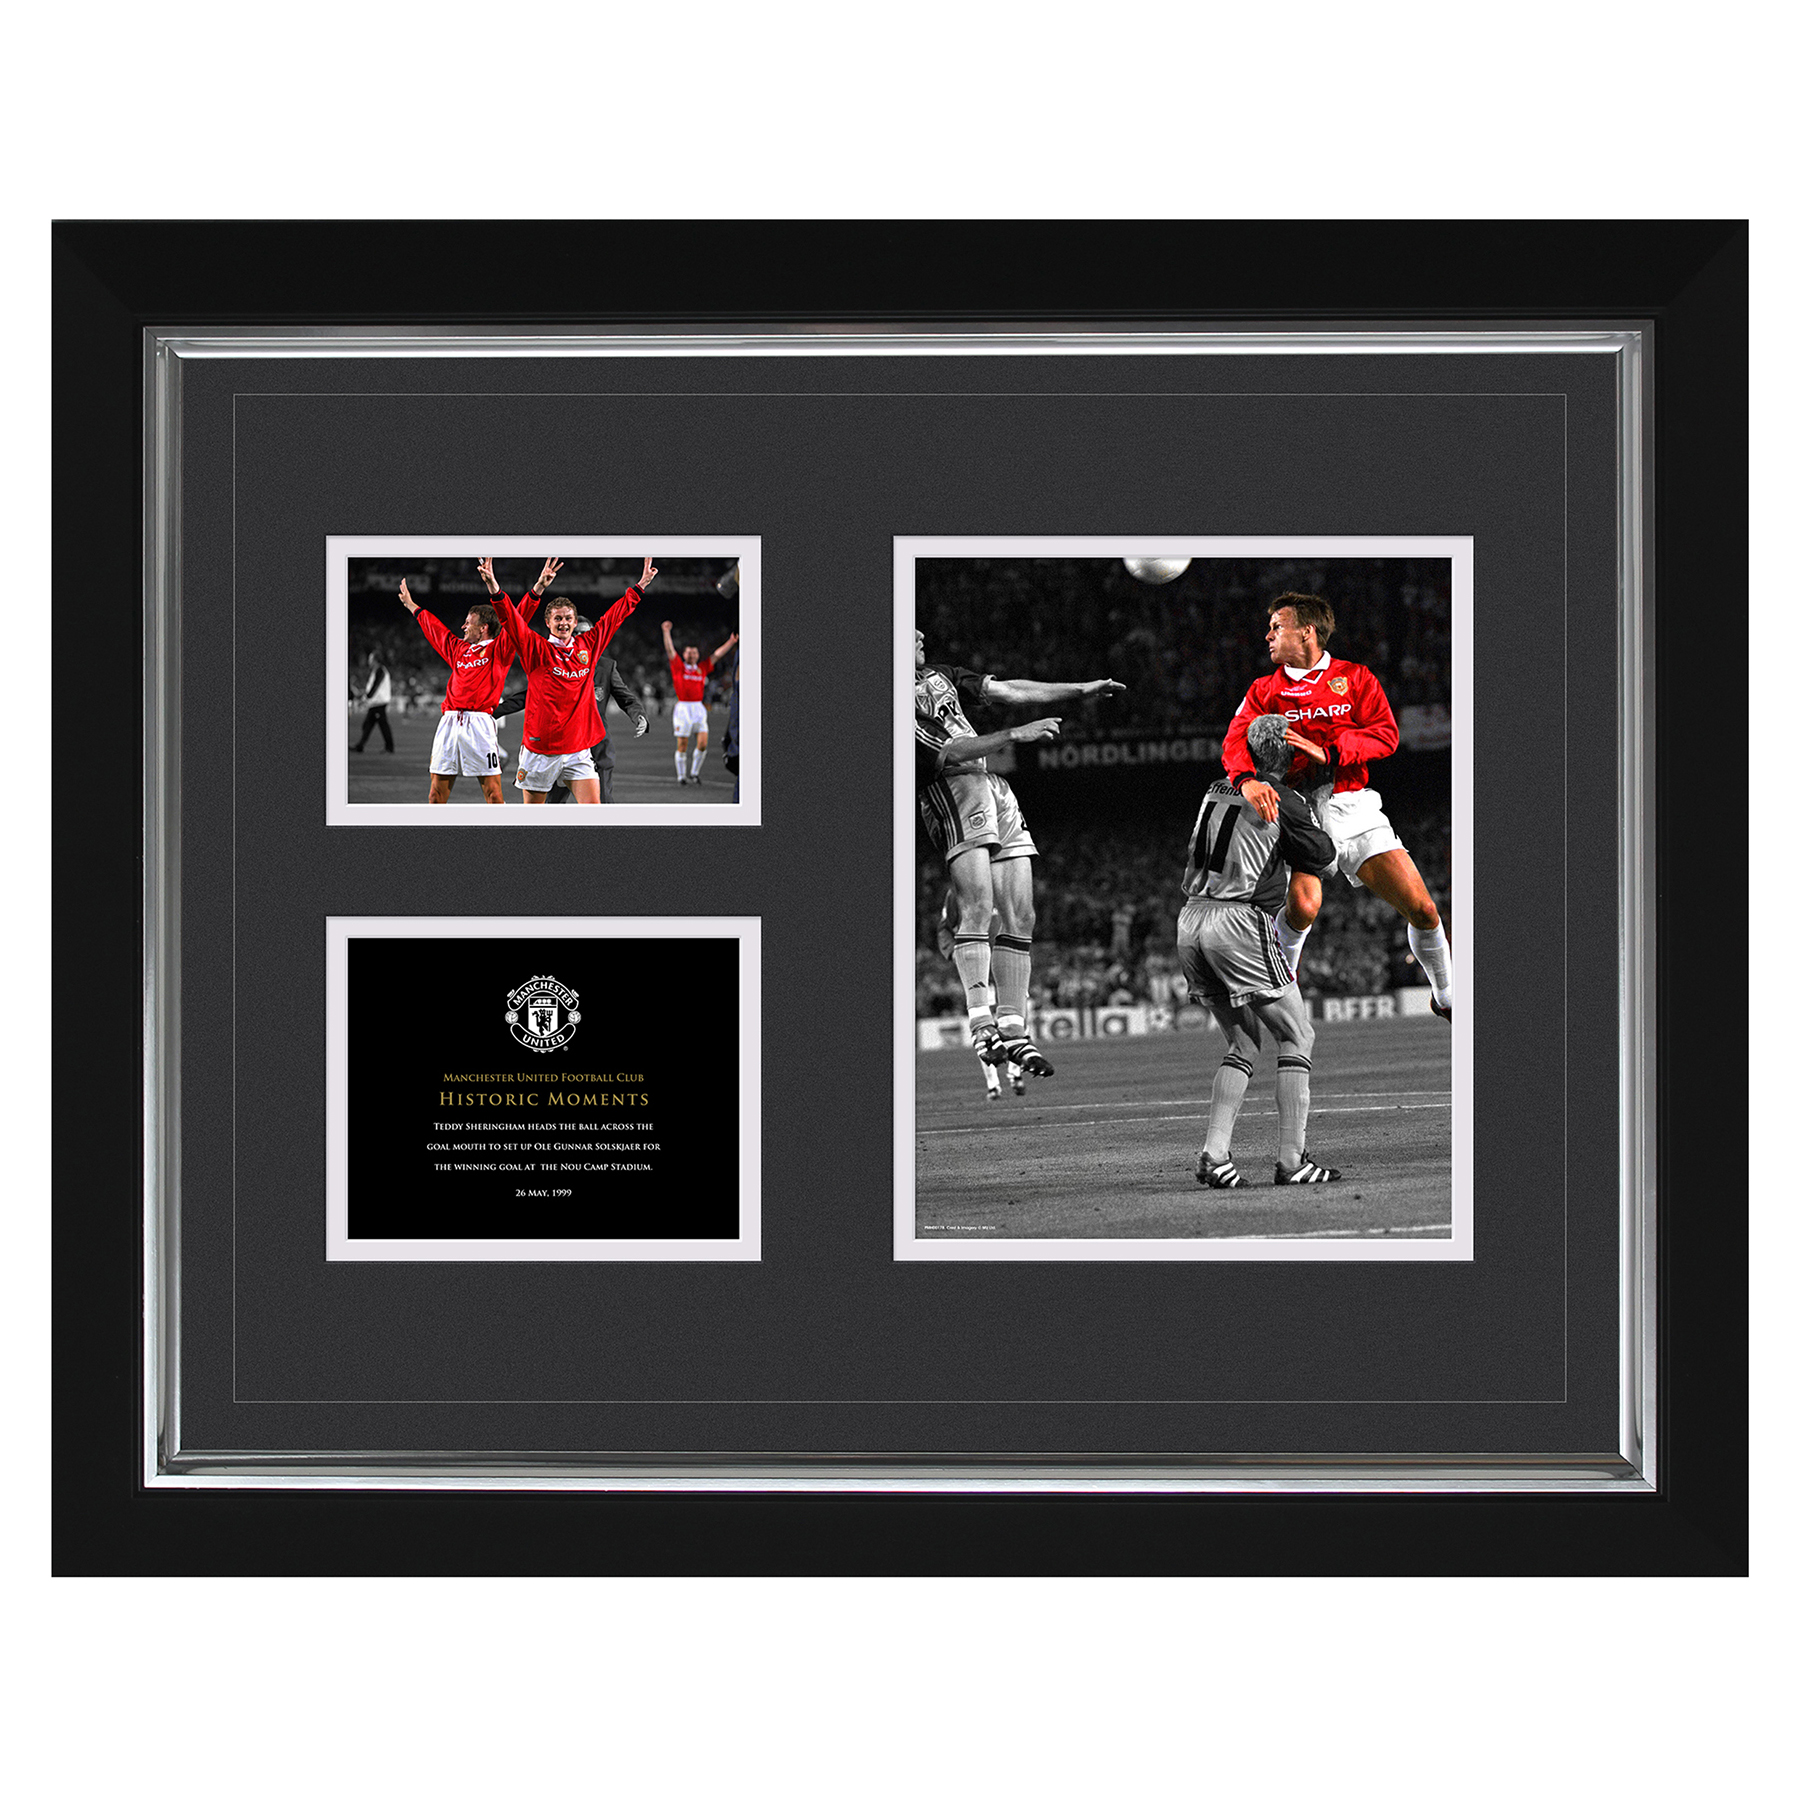 Manchester United Historic Moments - Sheringham 1999 Framed Print - 20 x 16